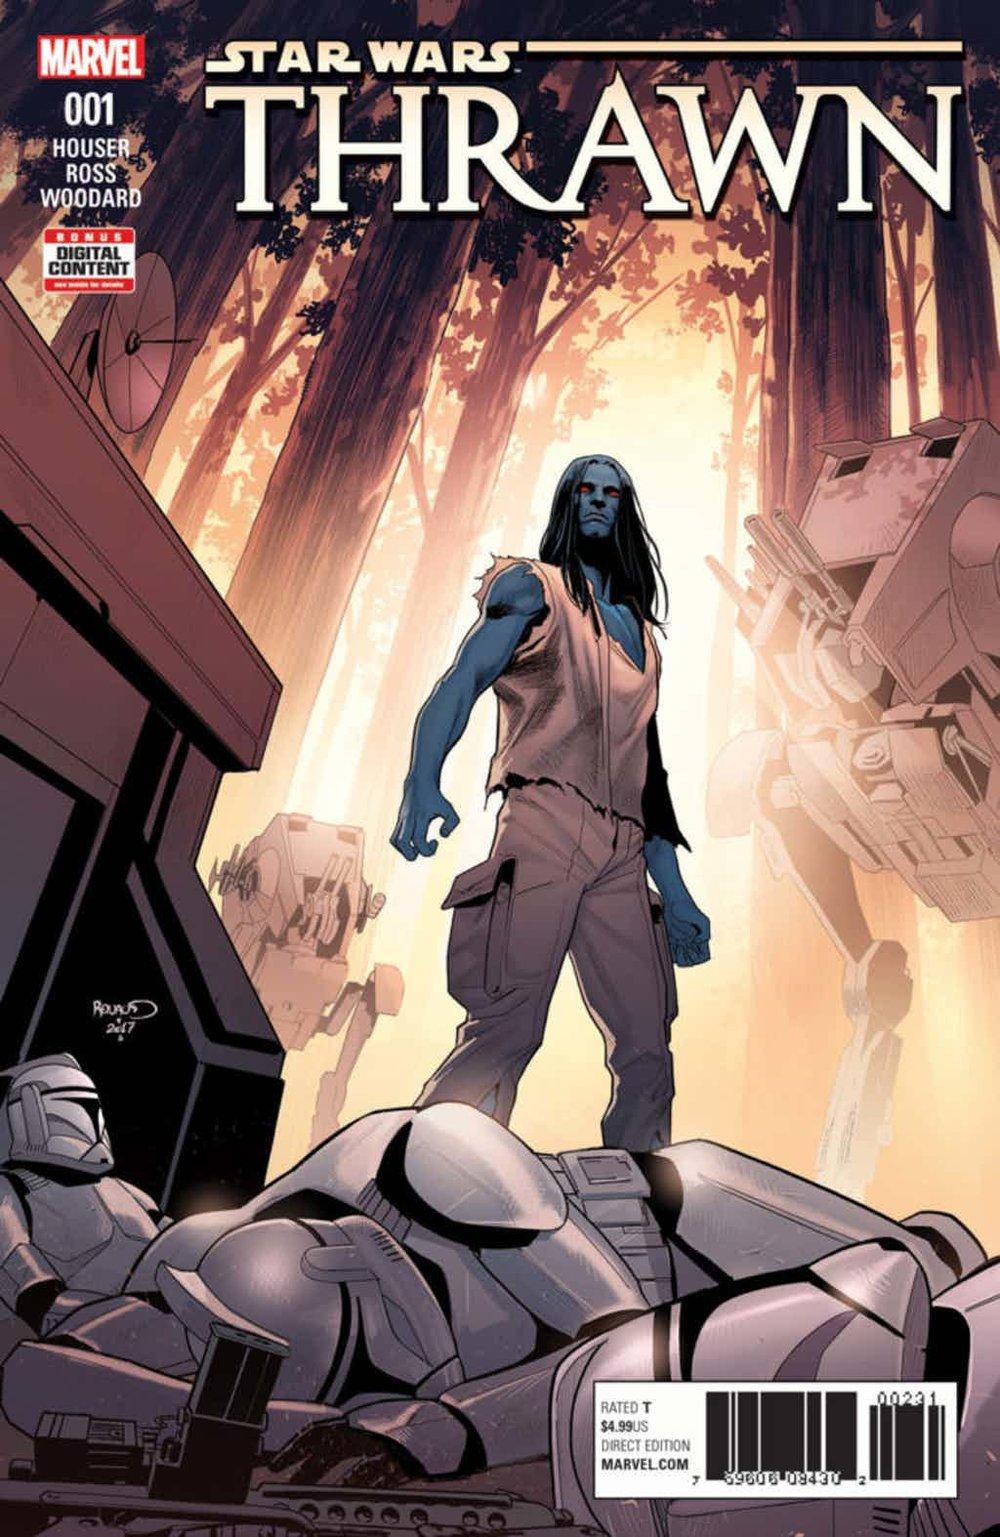 Marvel-Thrawn-Comic-Cover.jpg